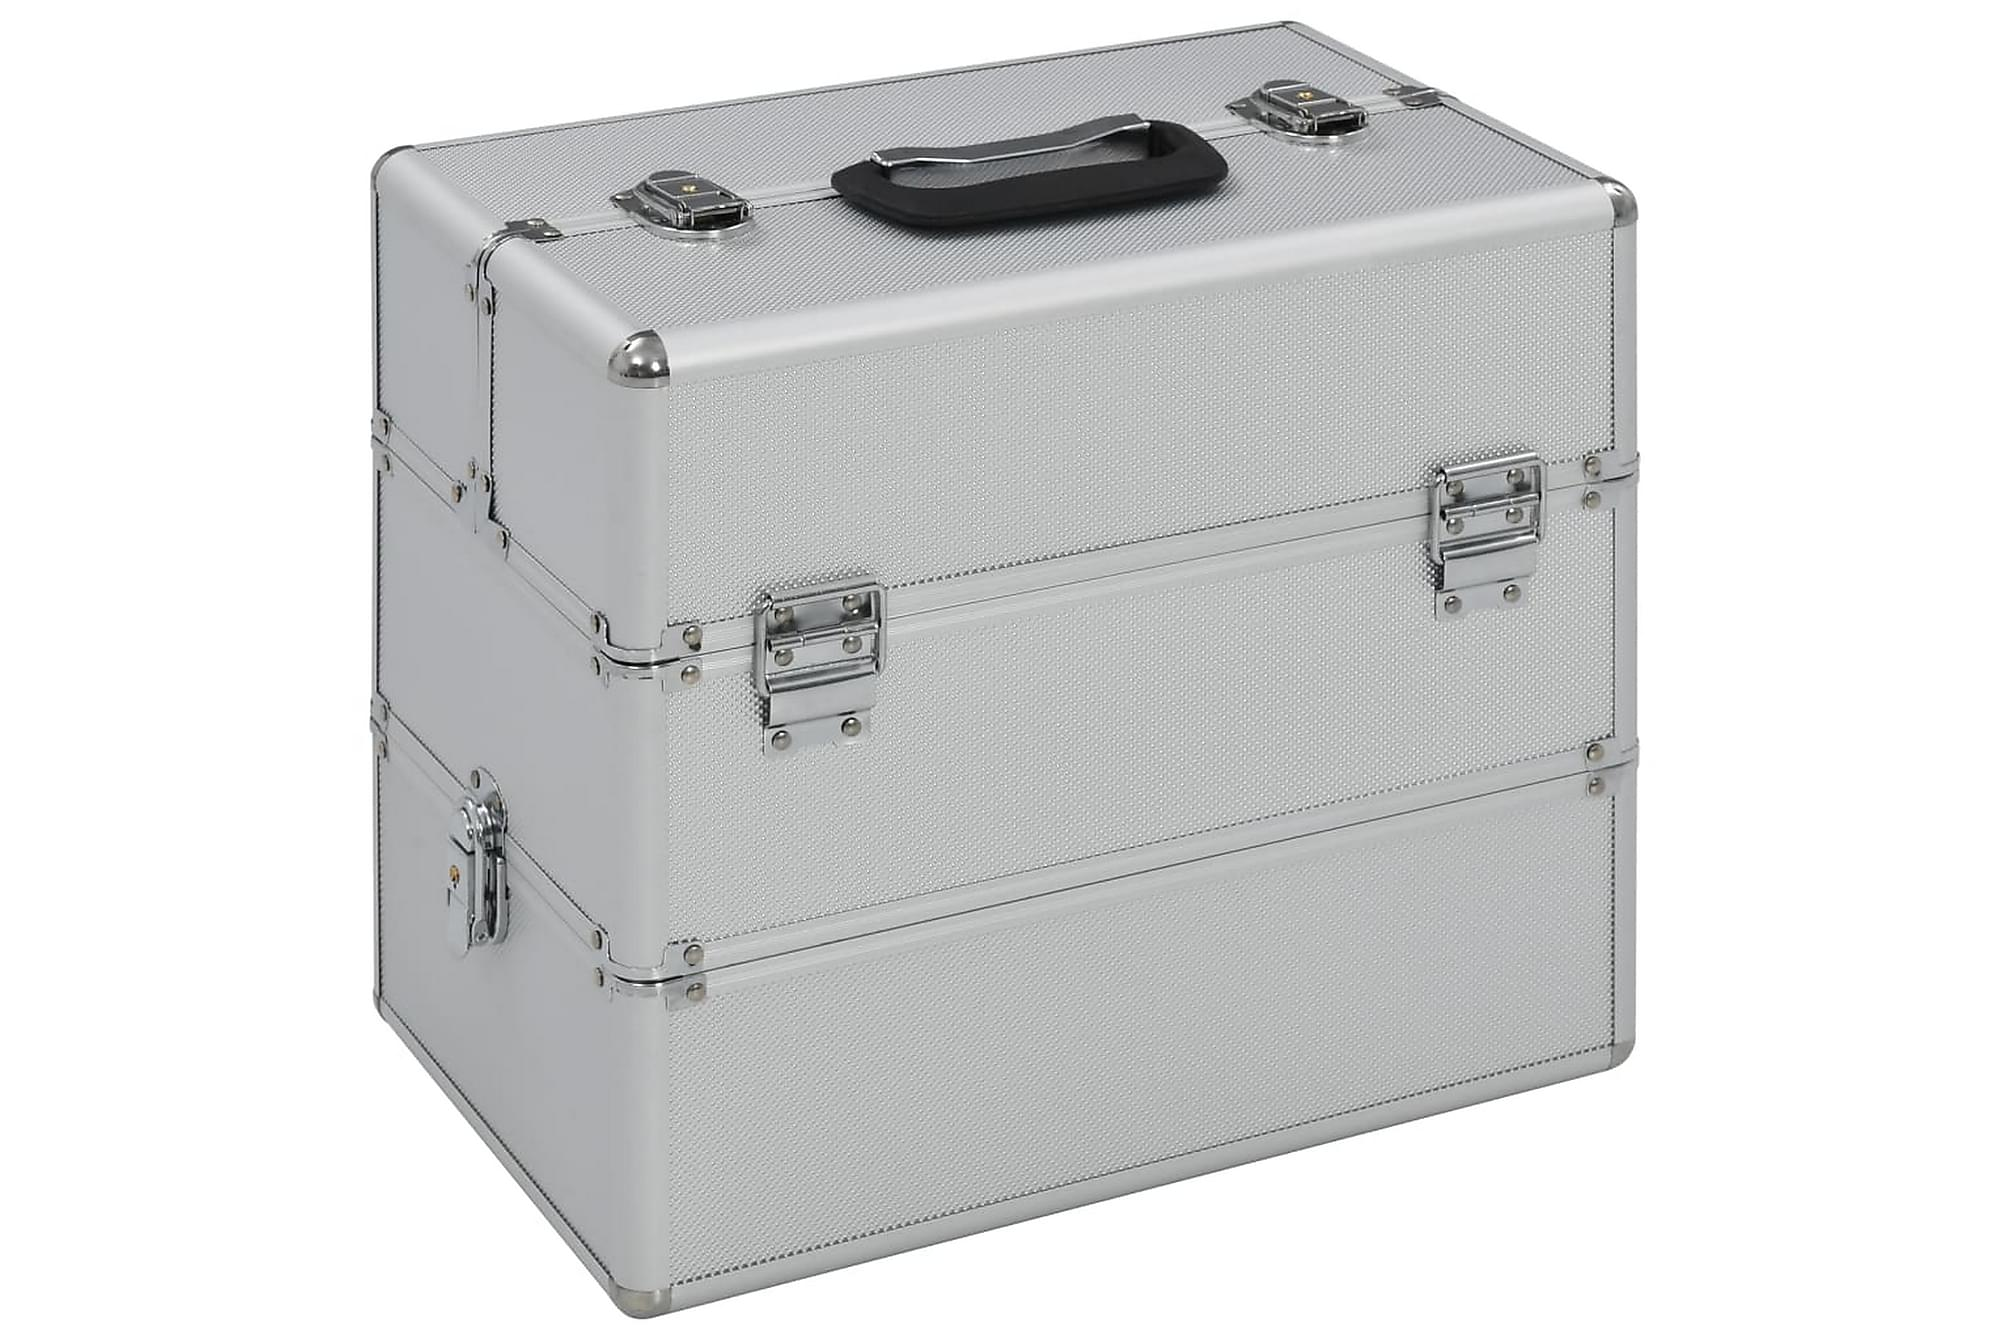 Sminklåda 37x24x35 cm silver aluminium